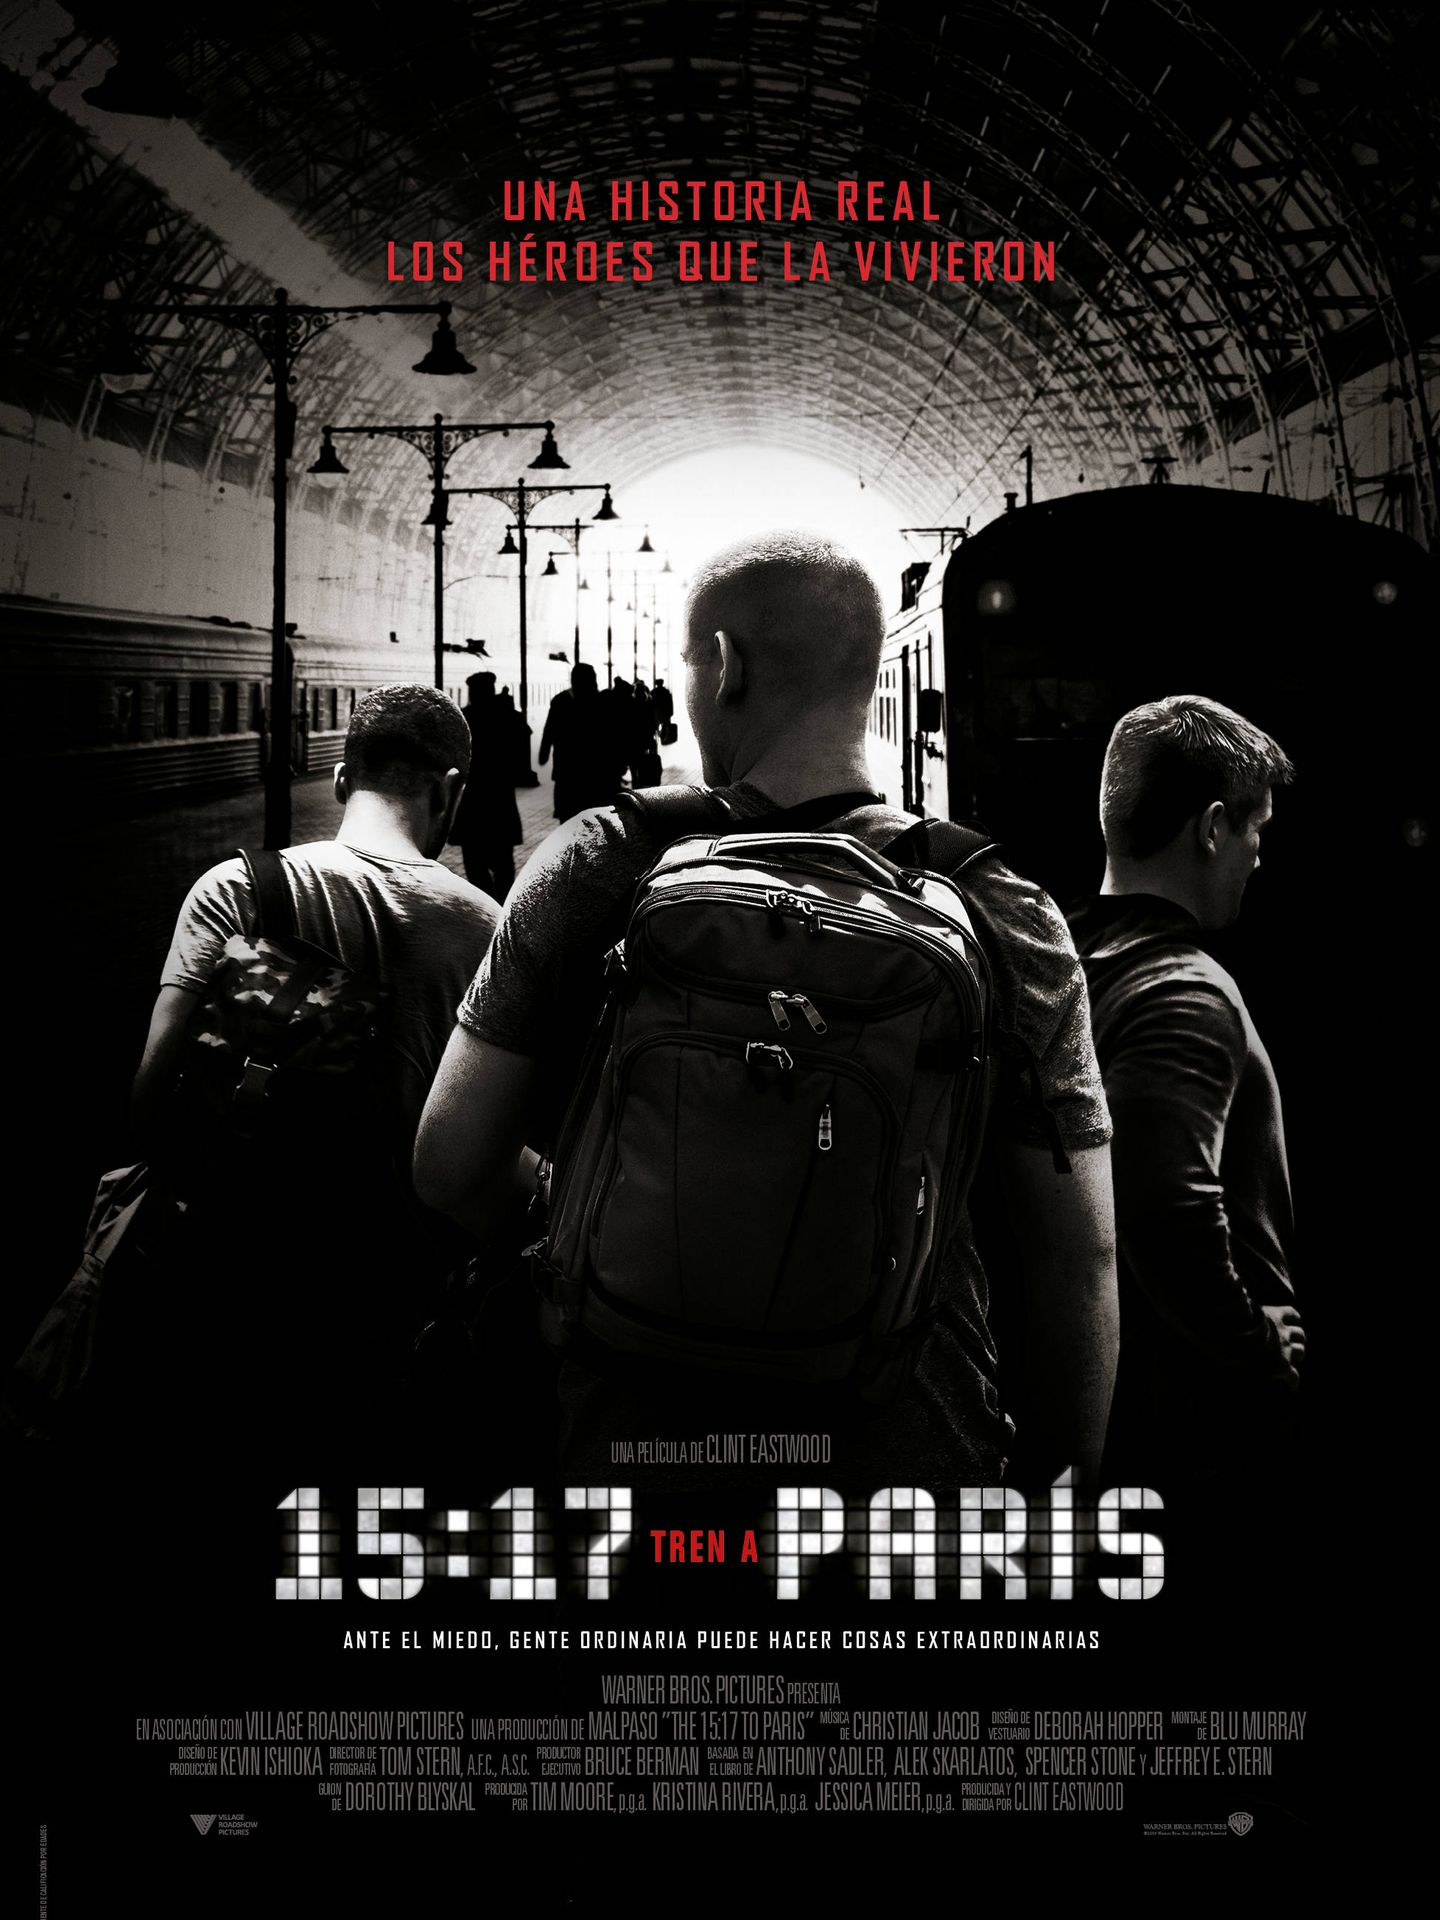 Cartel de '15:17 Tren a París'.